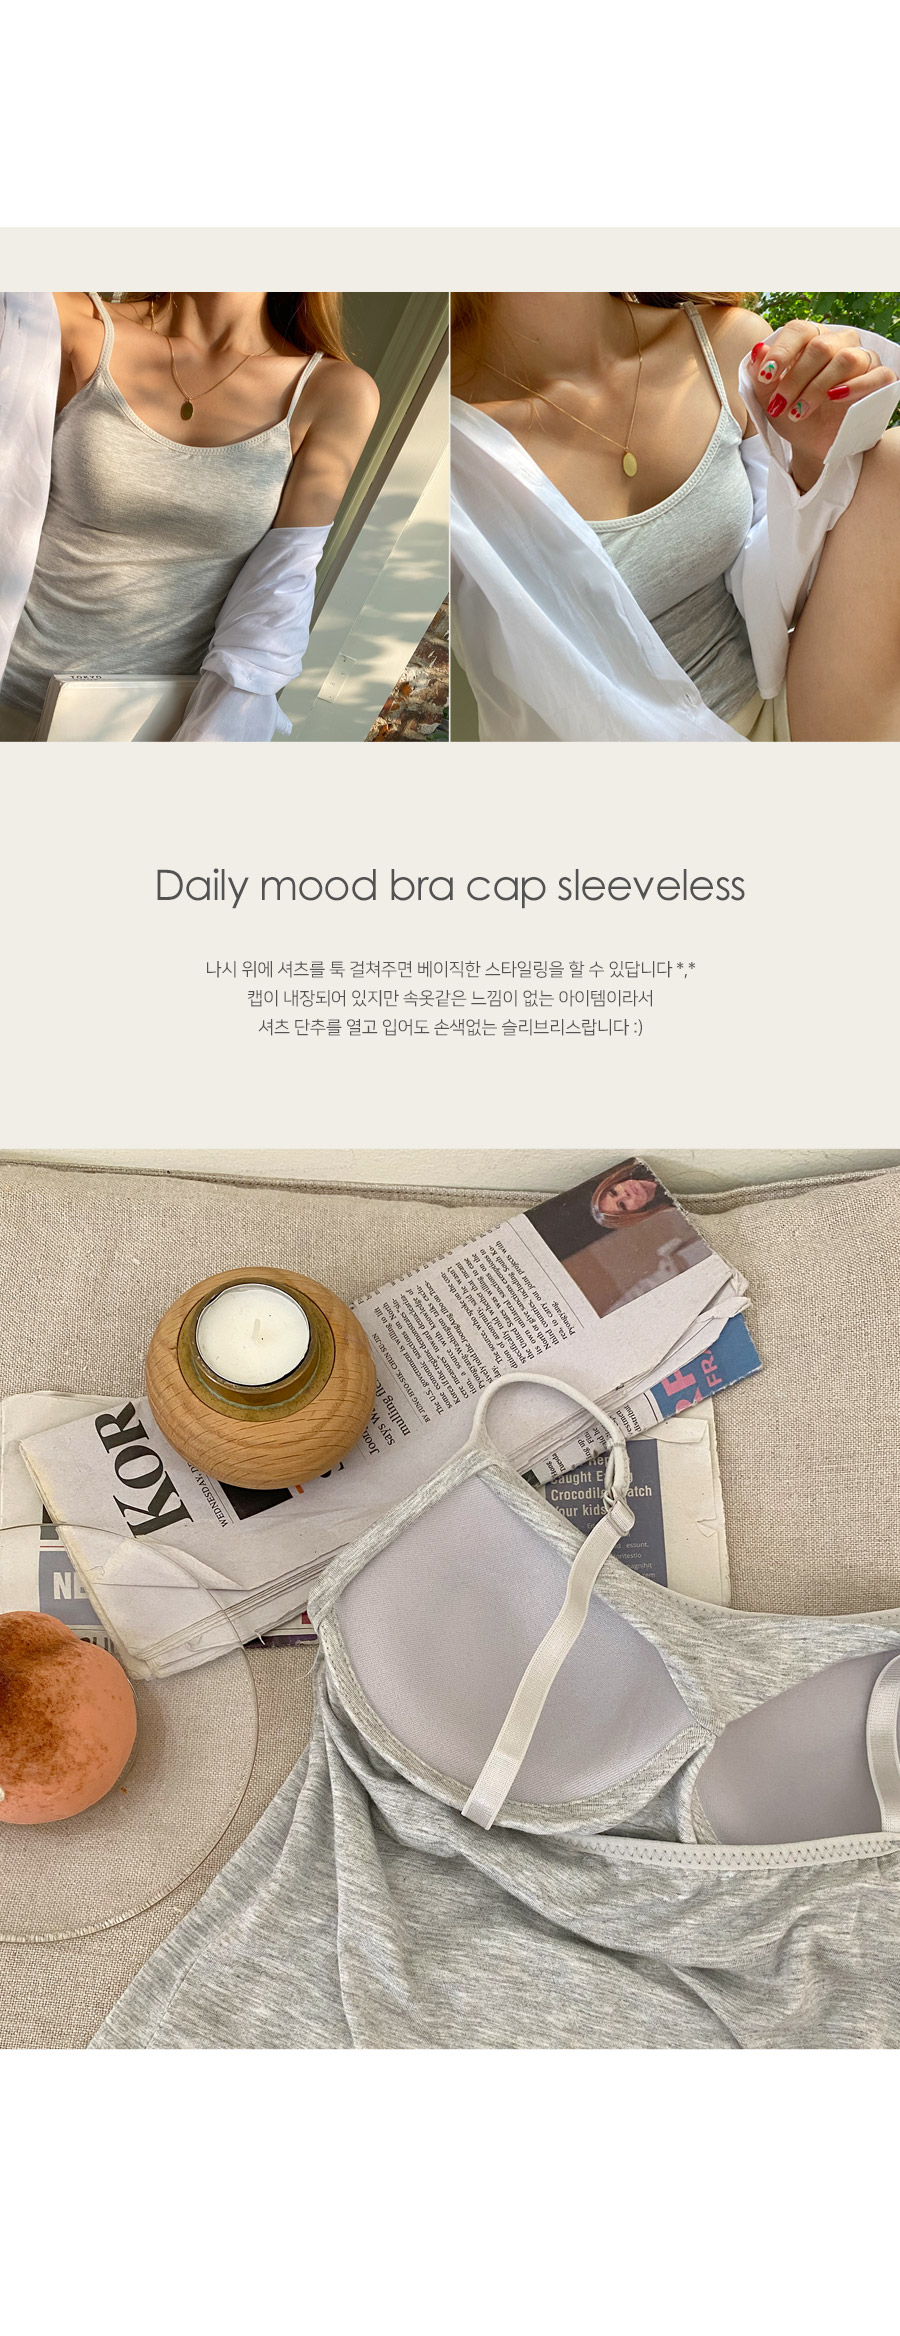 Daily mood bra cap strap adjustment Sleeveless